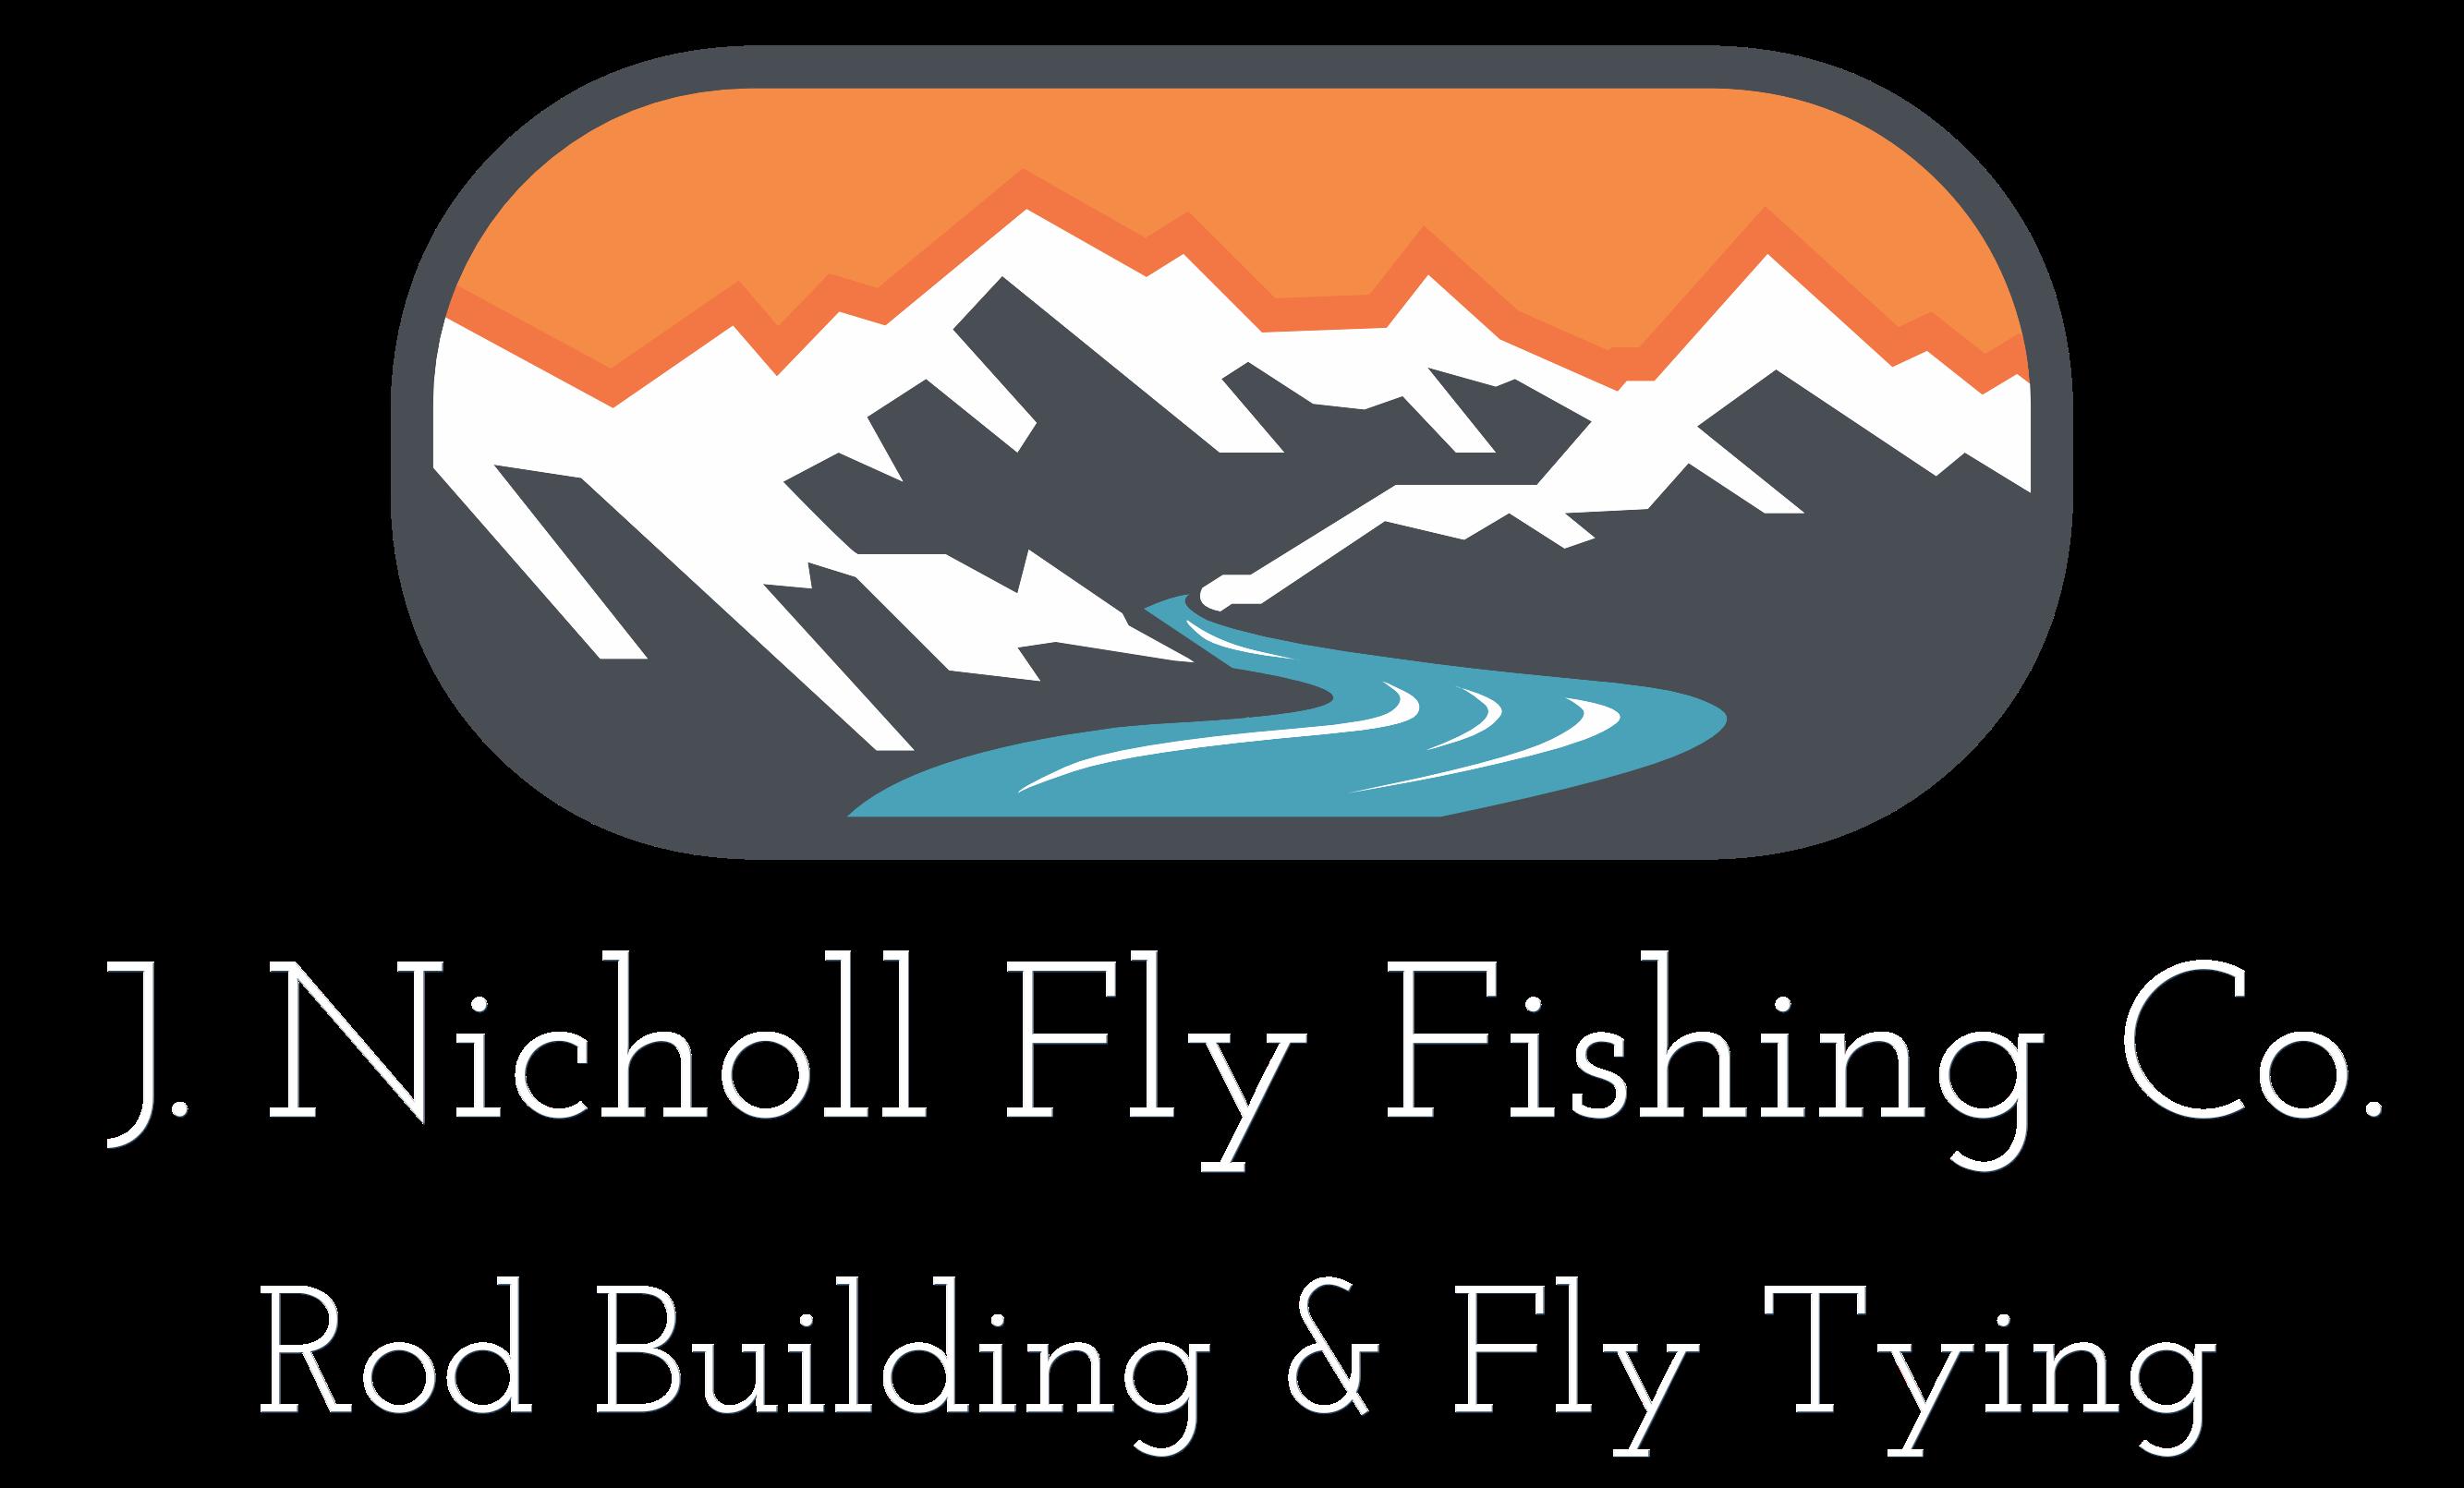 The J. Nicholl Fly Fishing Co.